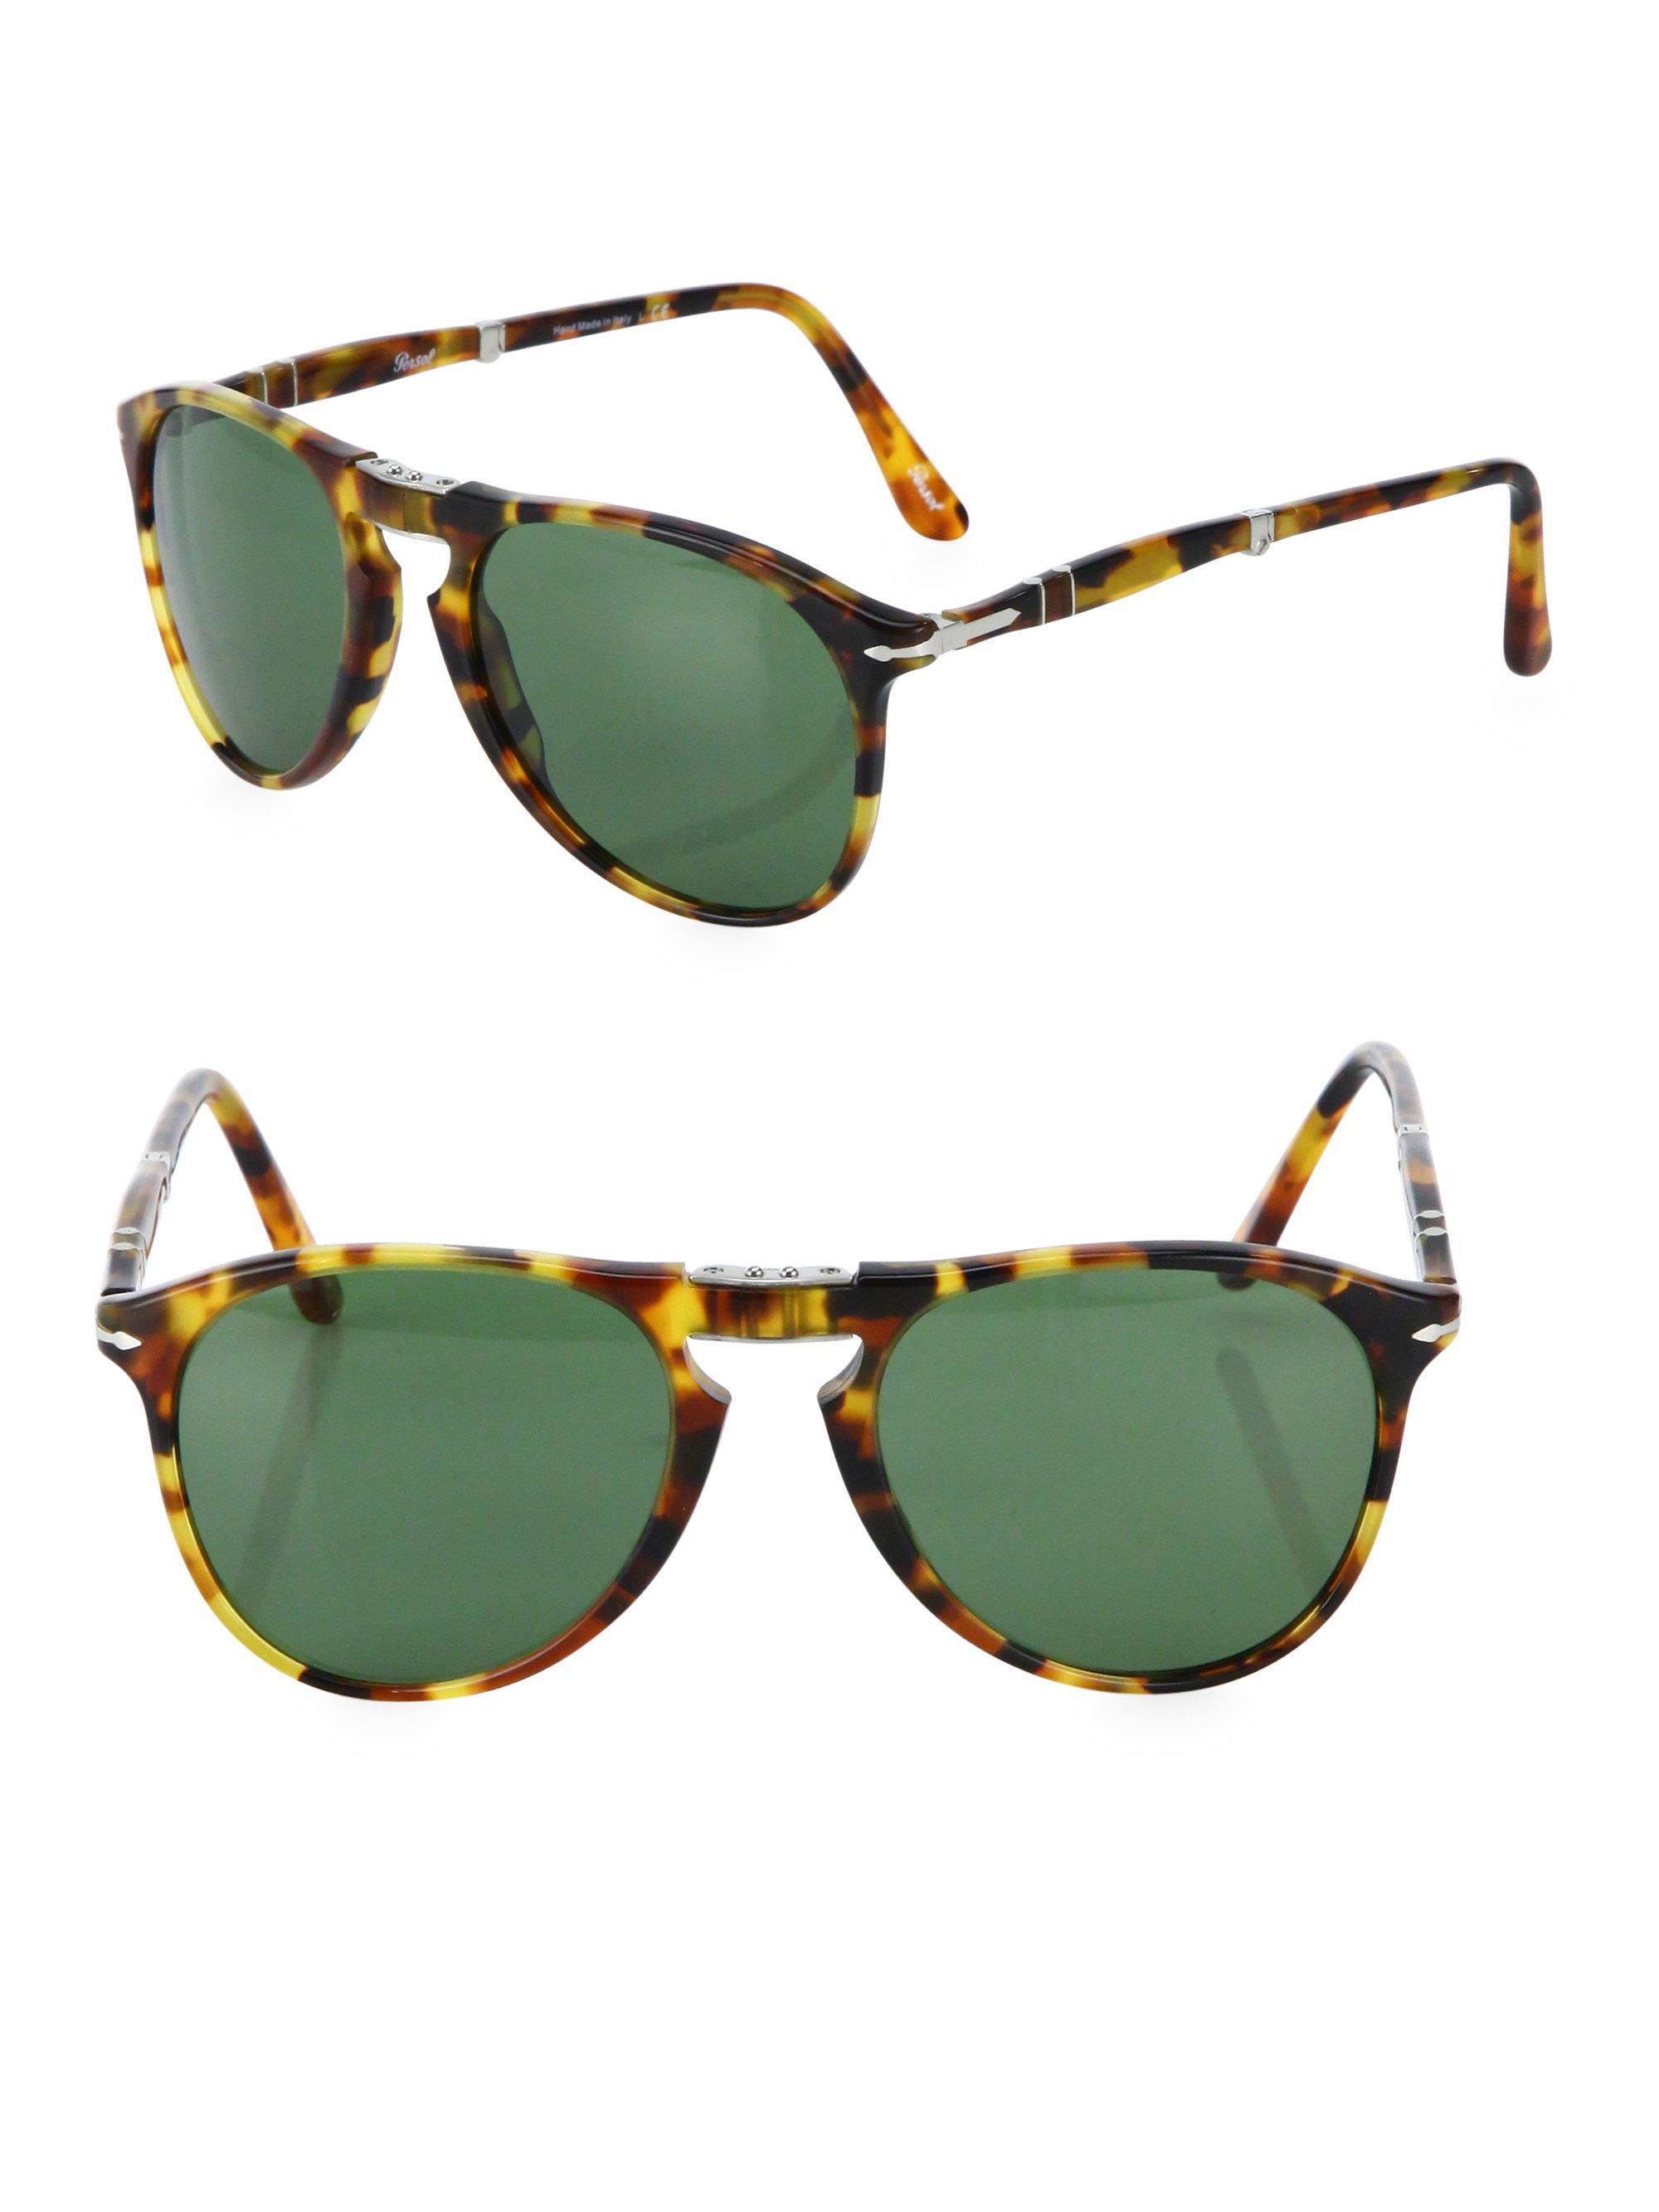 0dcc36413f4c8 Lyst - Persol 55mm Pilot Sunglasses in Green for Men